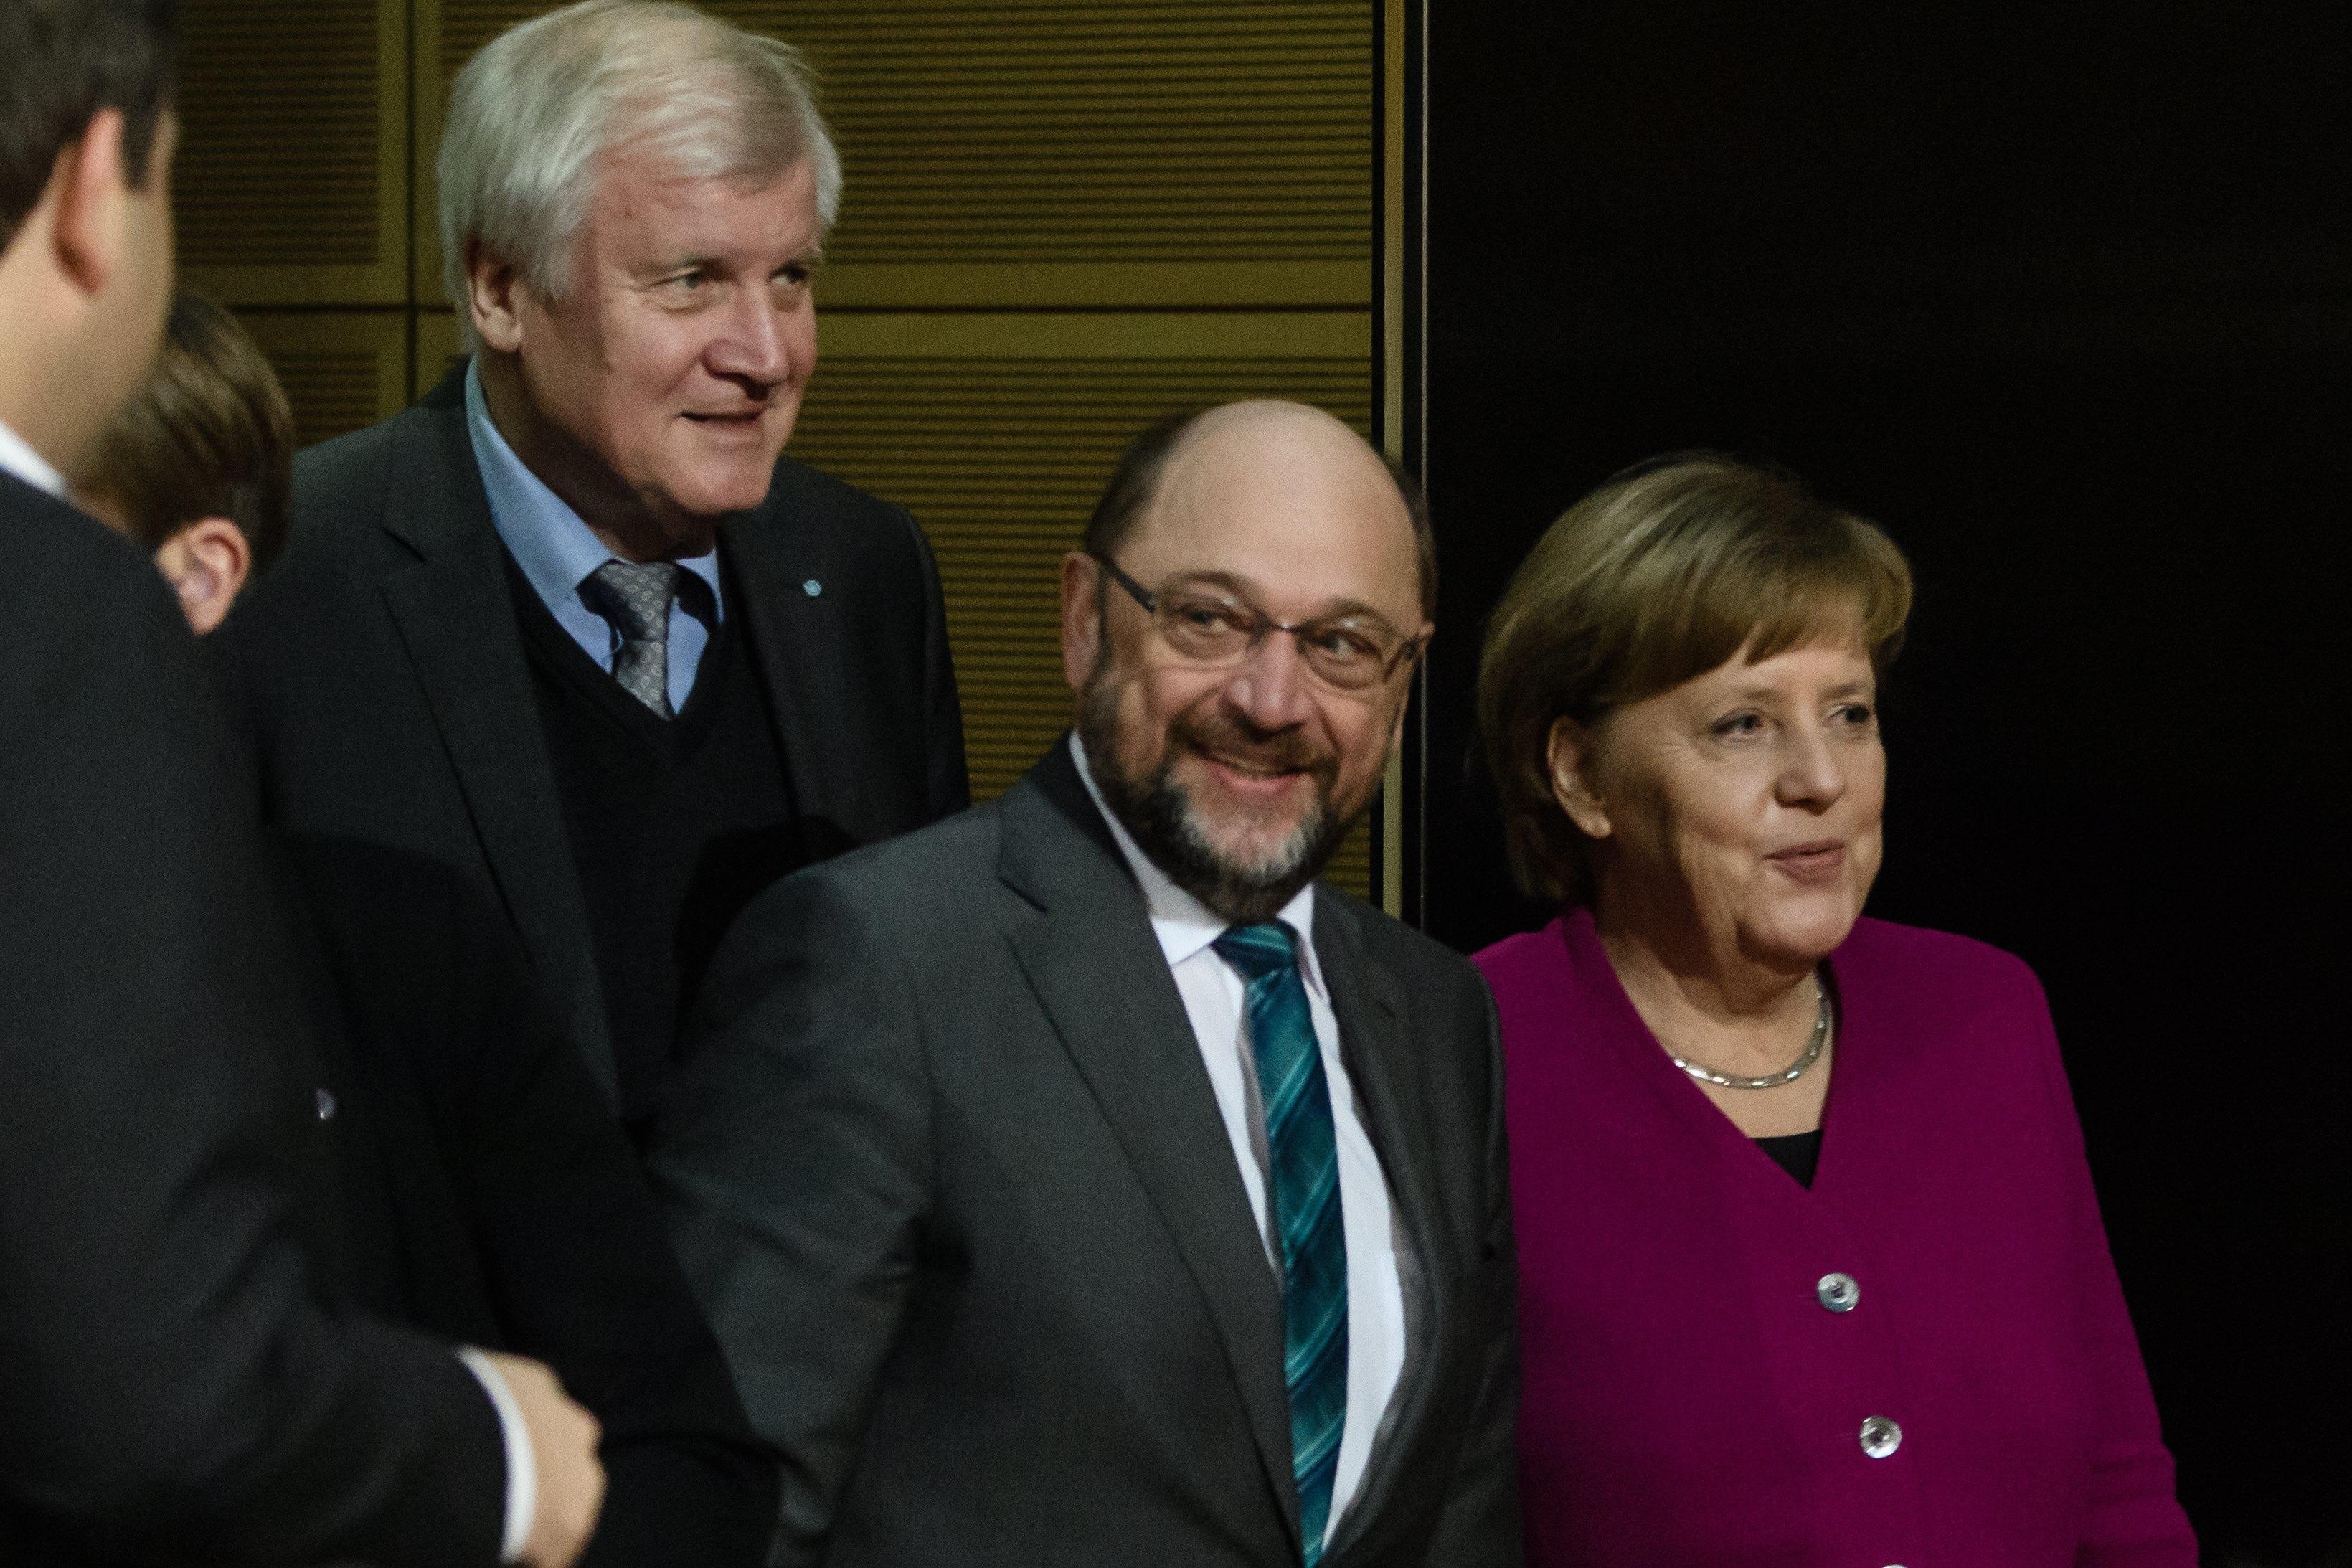 Schulz abandona a liderança do SPD para assumir a diplomacia alemã